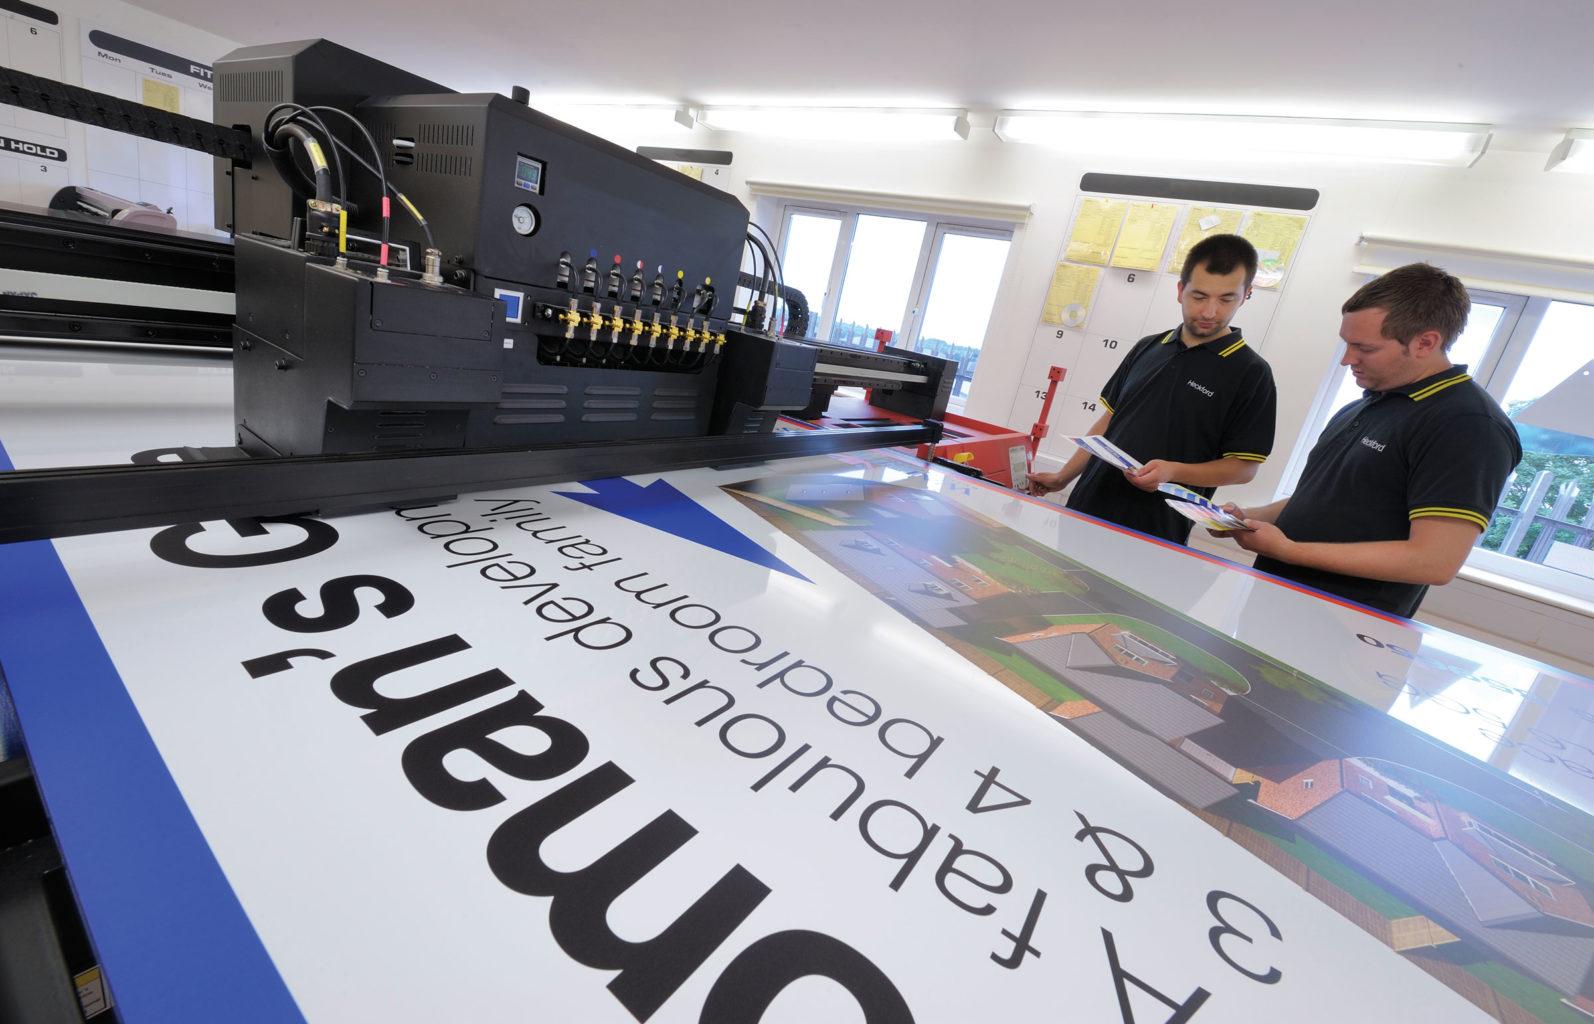 Heckford Large format printing